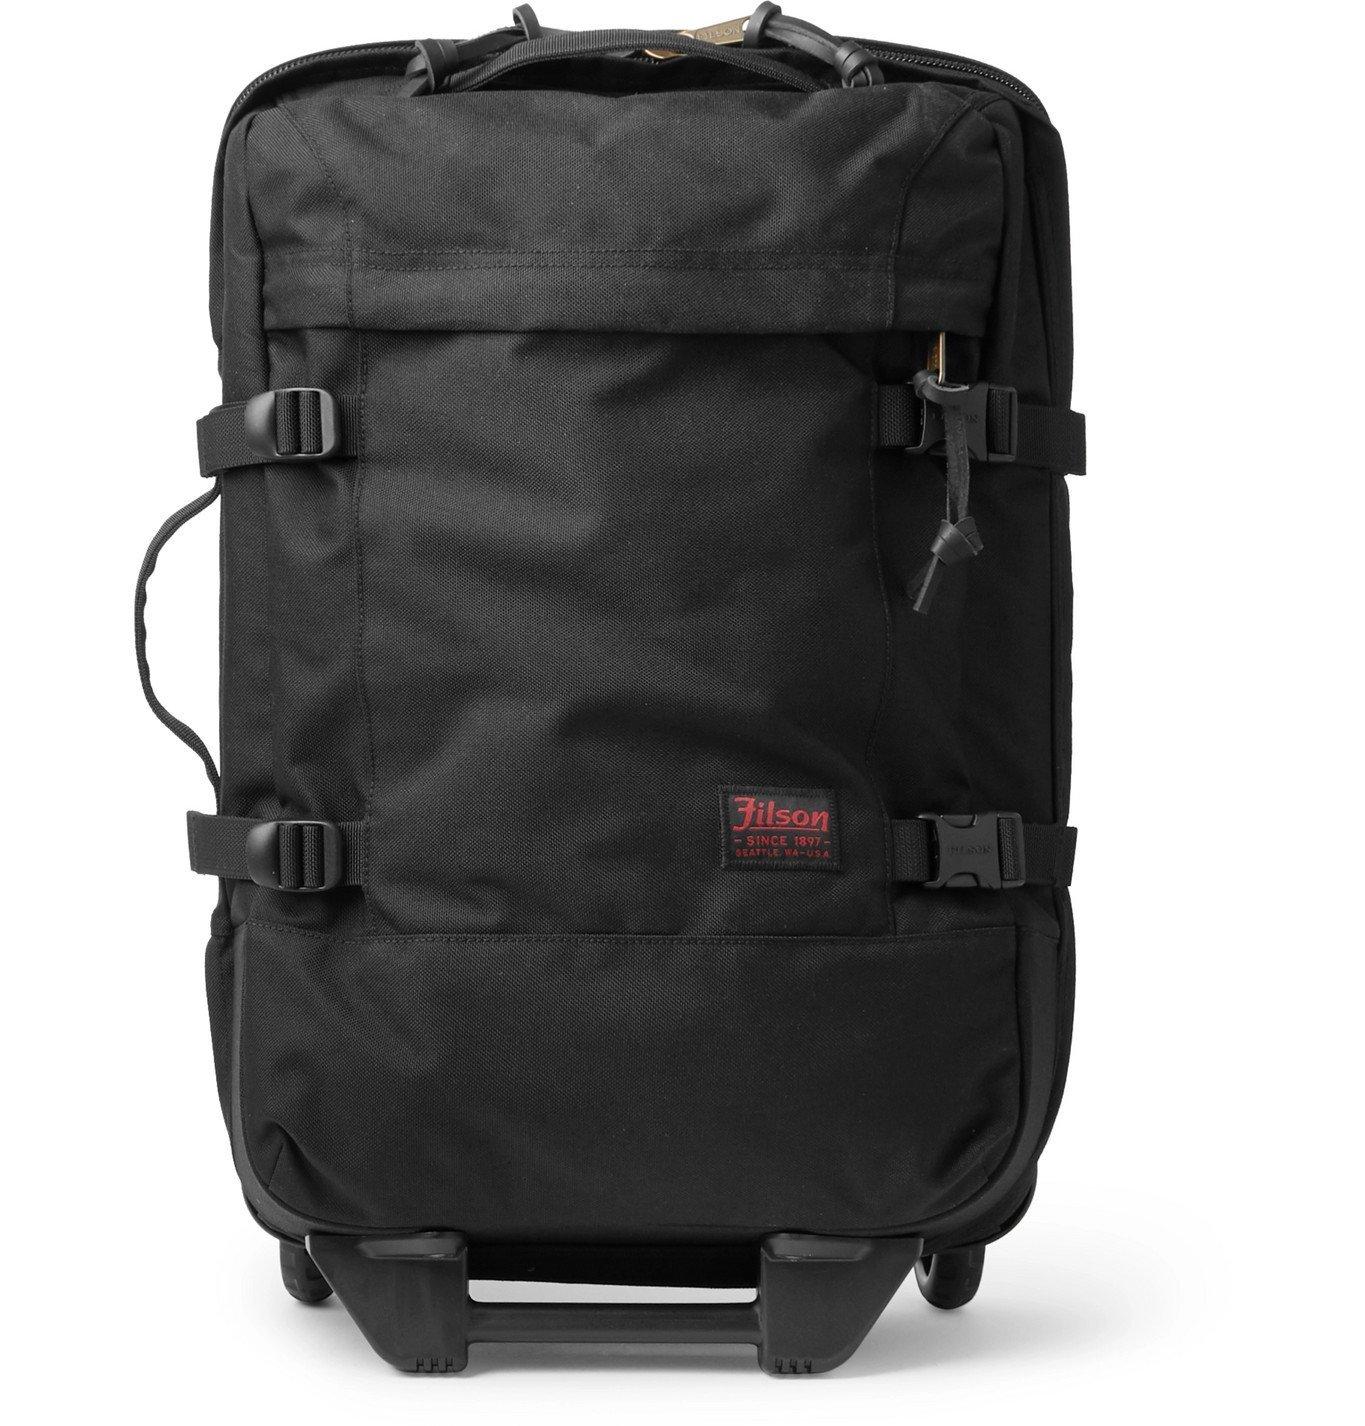 Filson - Dryden 56cm Leather-Trimmed CORDURA Carry-On Suitcase - Blue